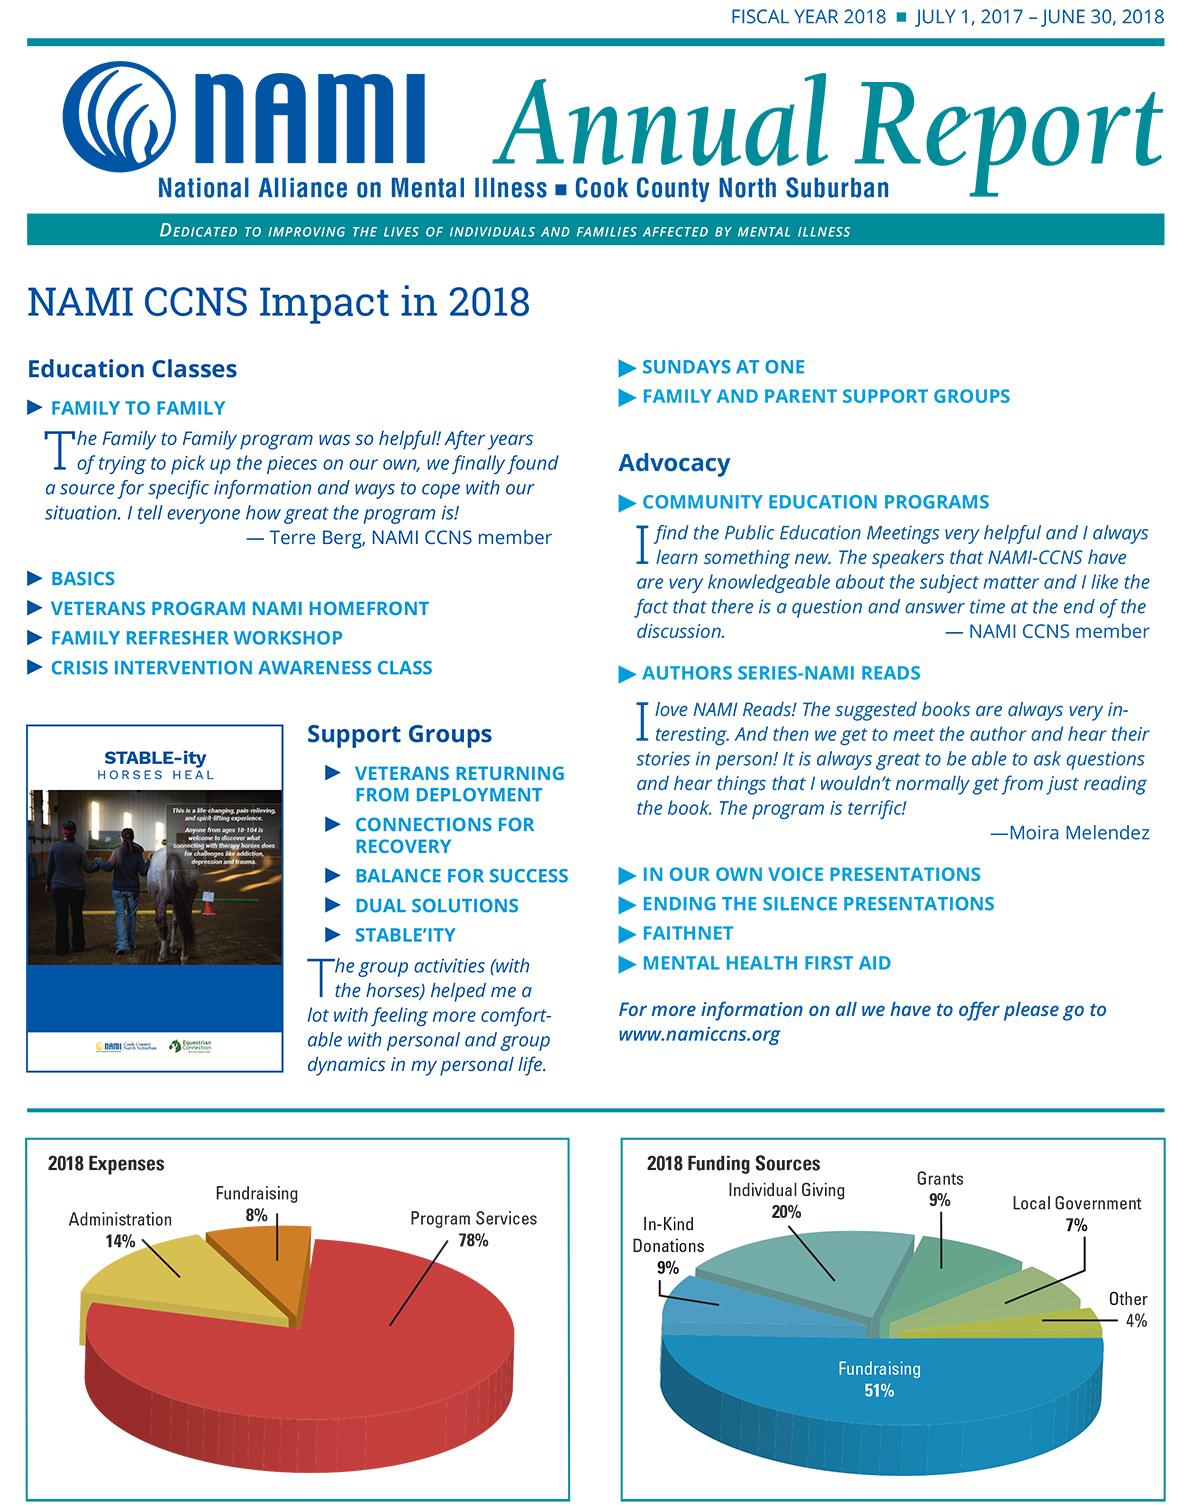 2018 Annual Report NAMI CCNS